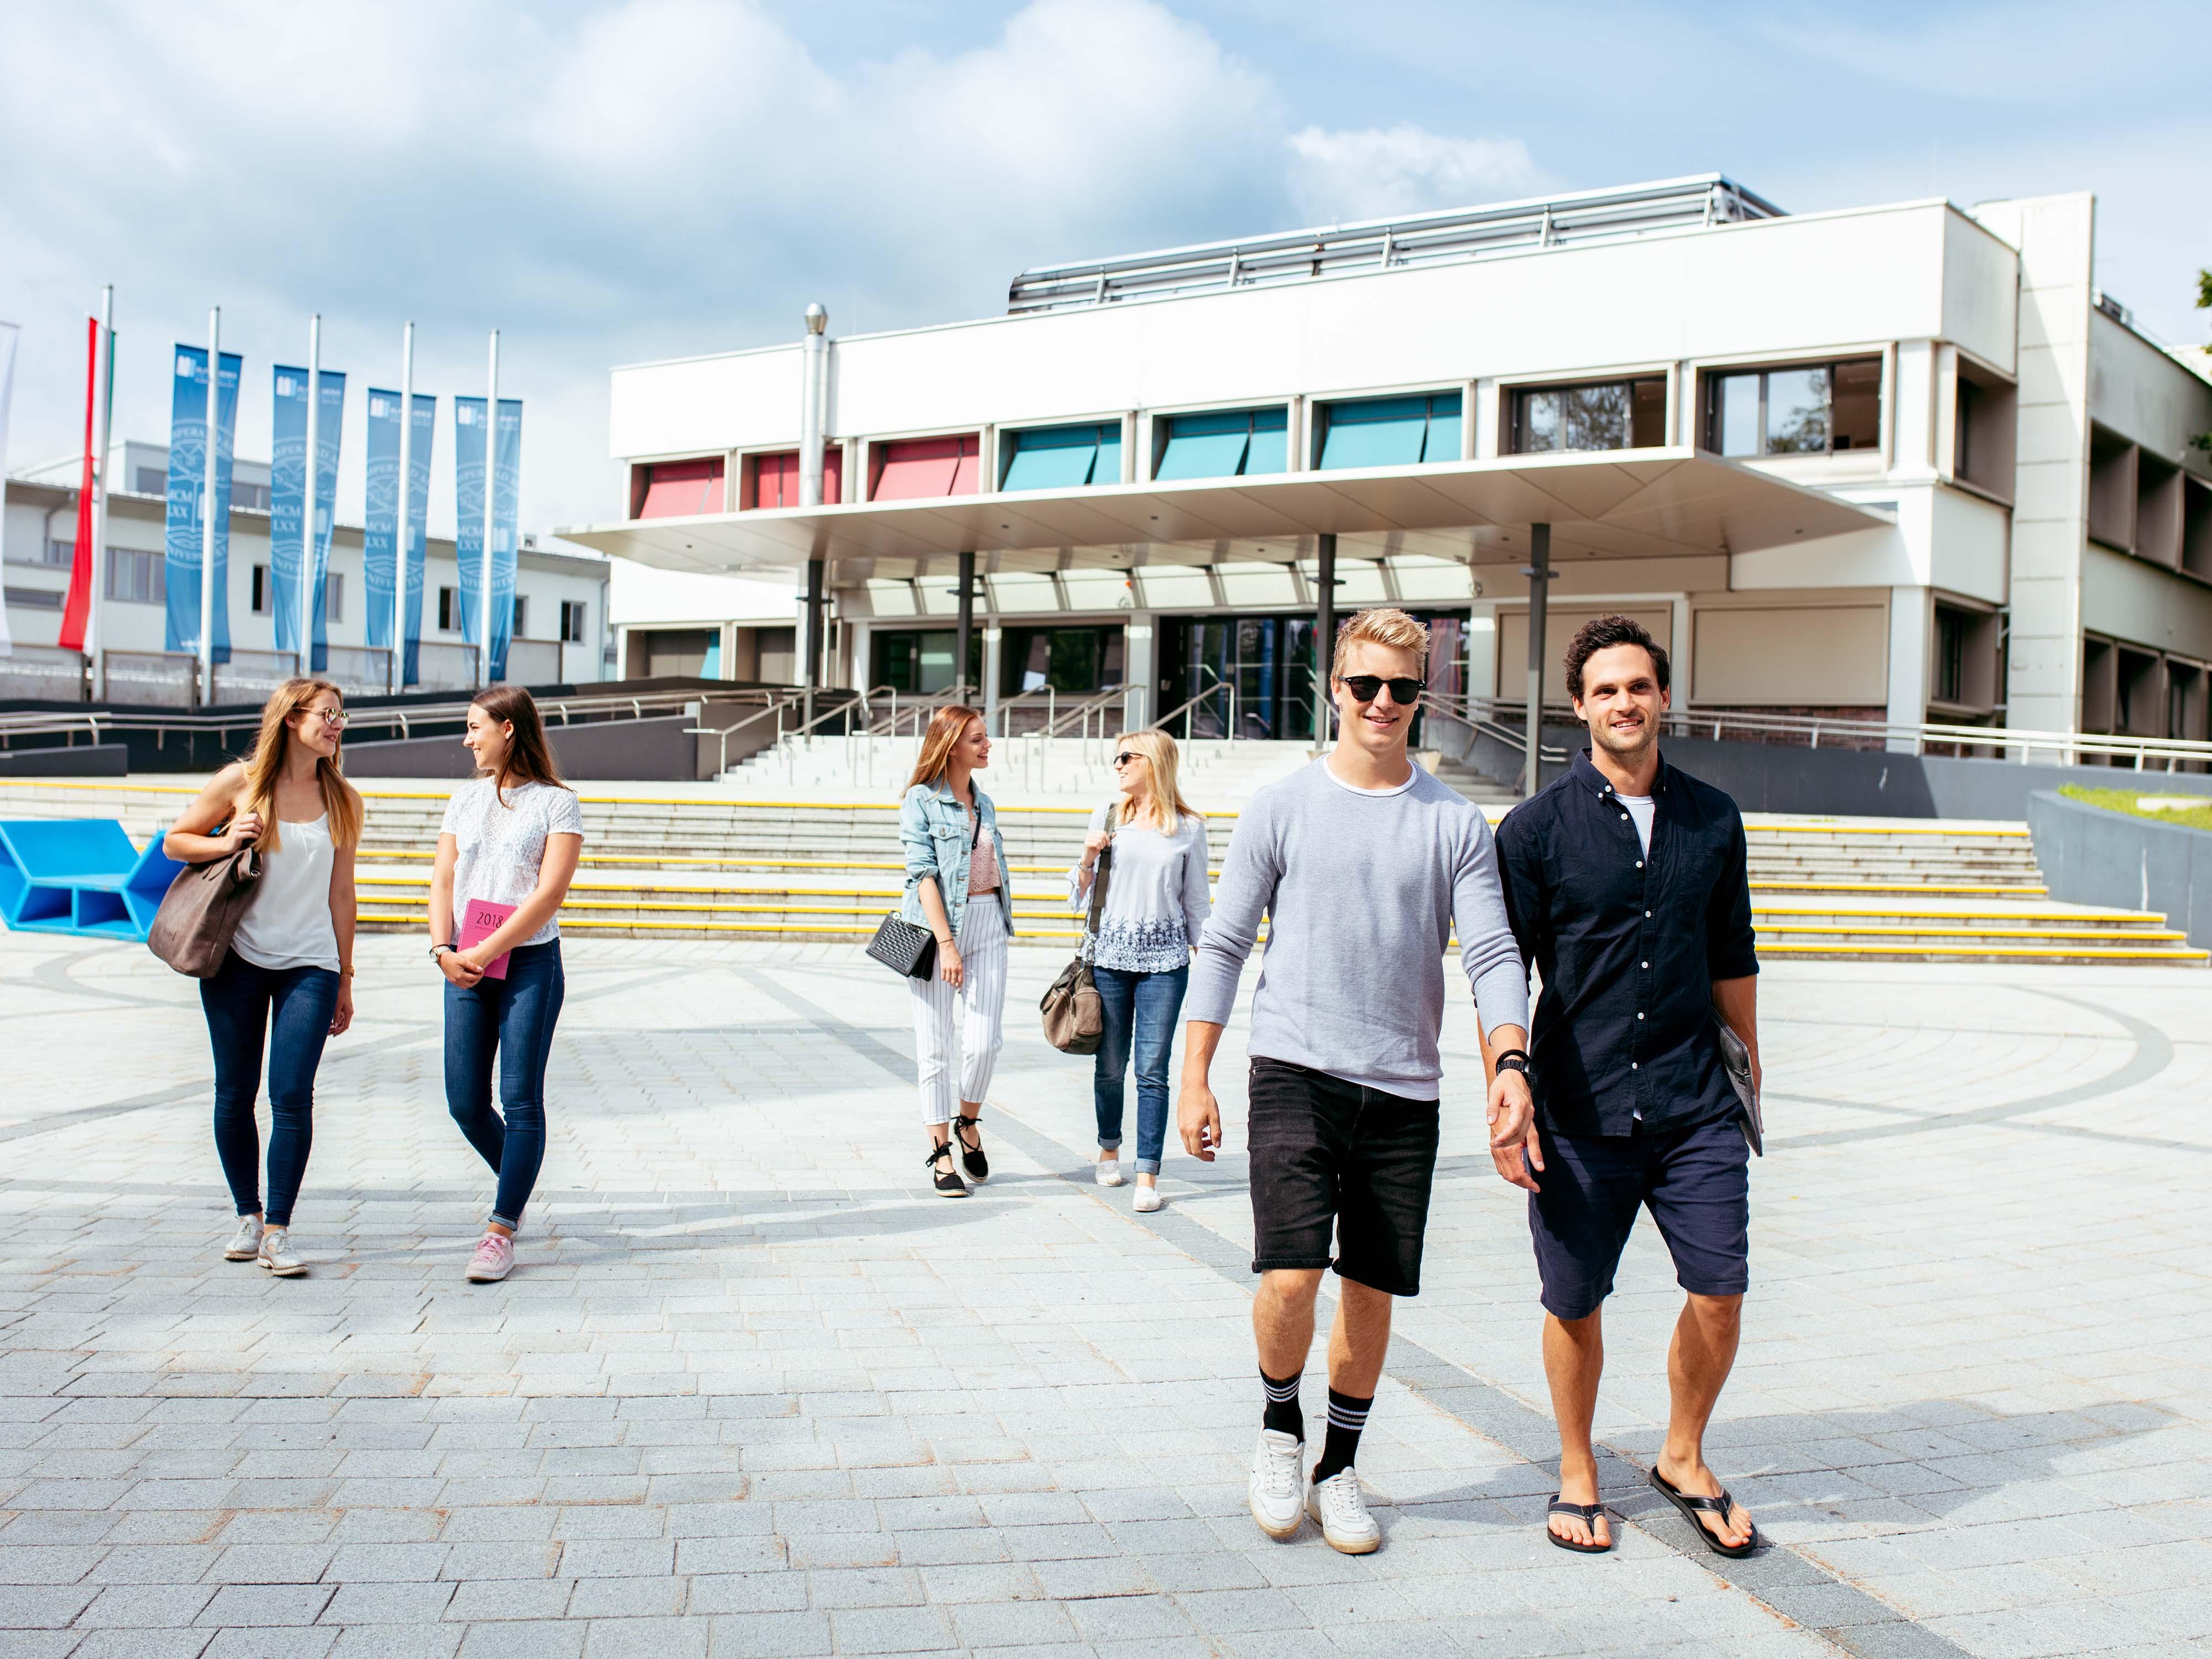 Main entrance University of Klagenfurt